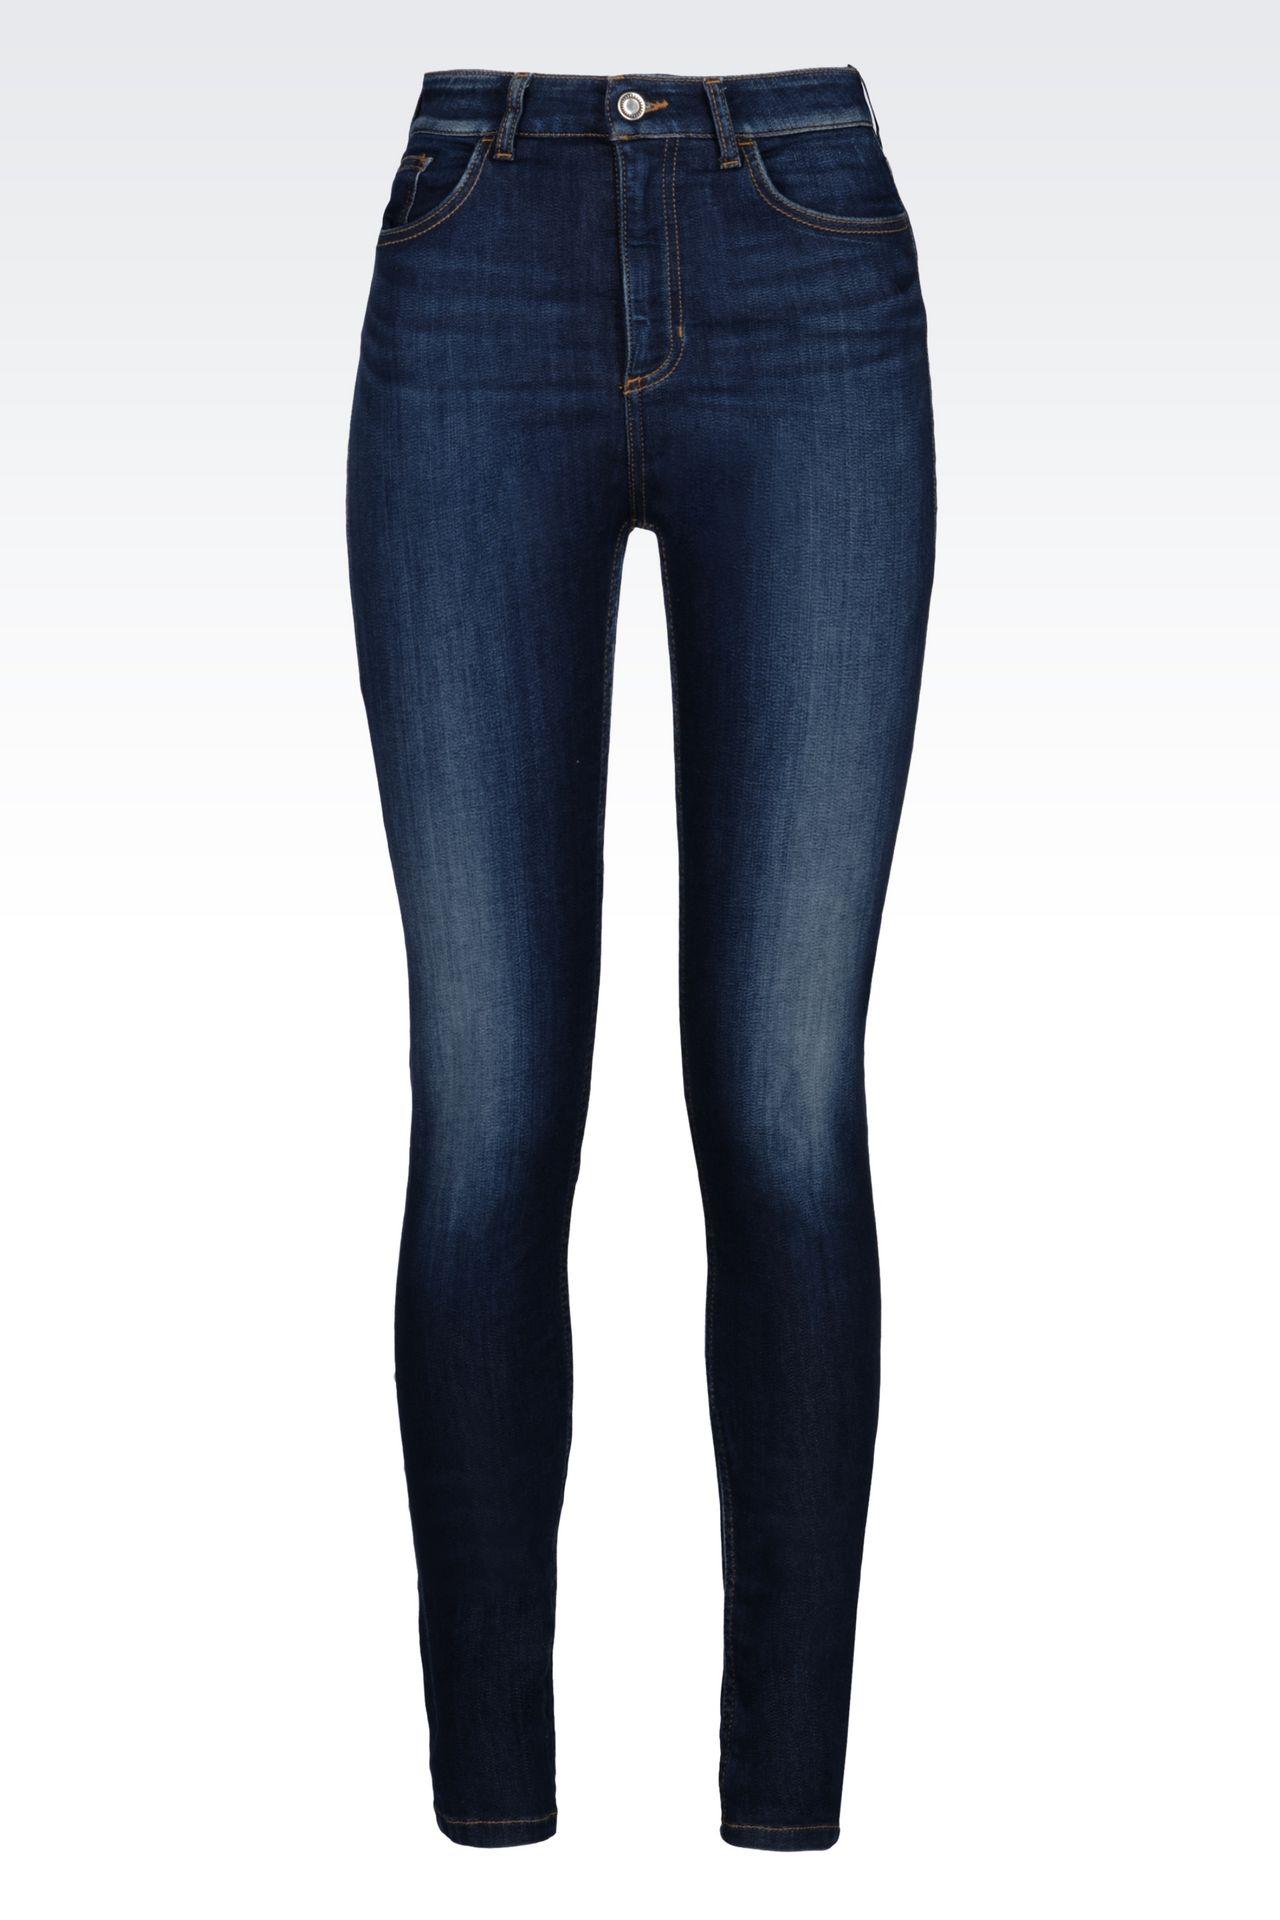 SUPER SKINNY MEDIUM DARK WASH JEANS: Jeans Women by Armani - 0